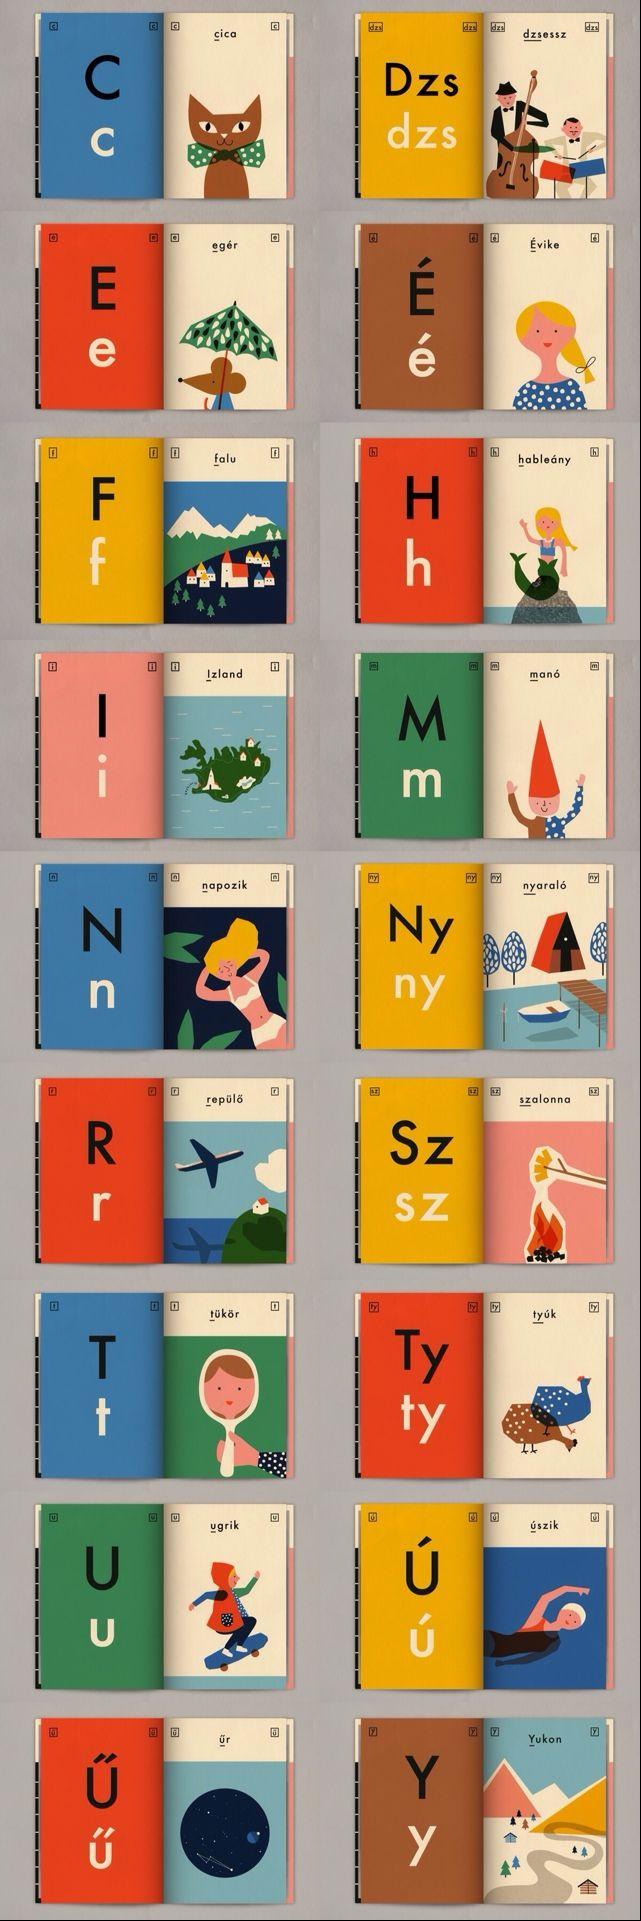 """Ábécés könyv"" - 44 letters of the Hungarian alphabet. By Anna Kövecses."